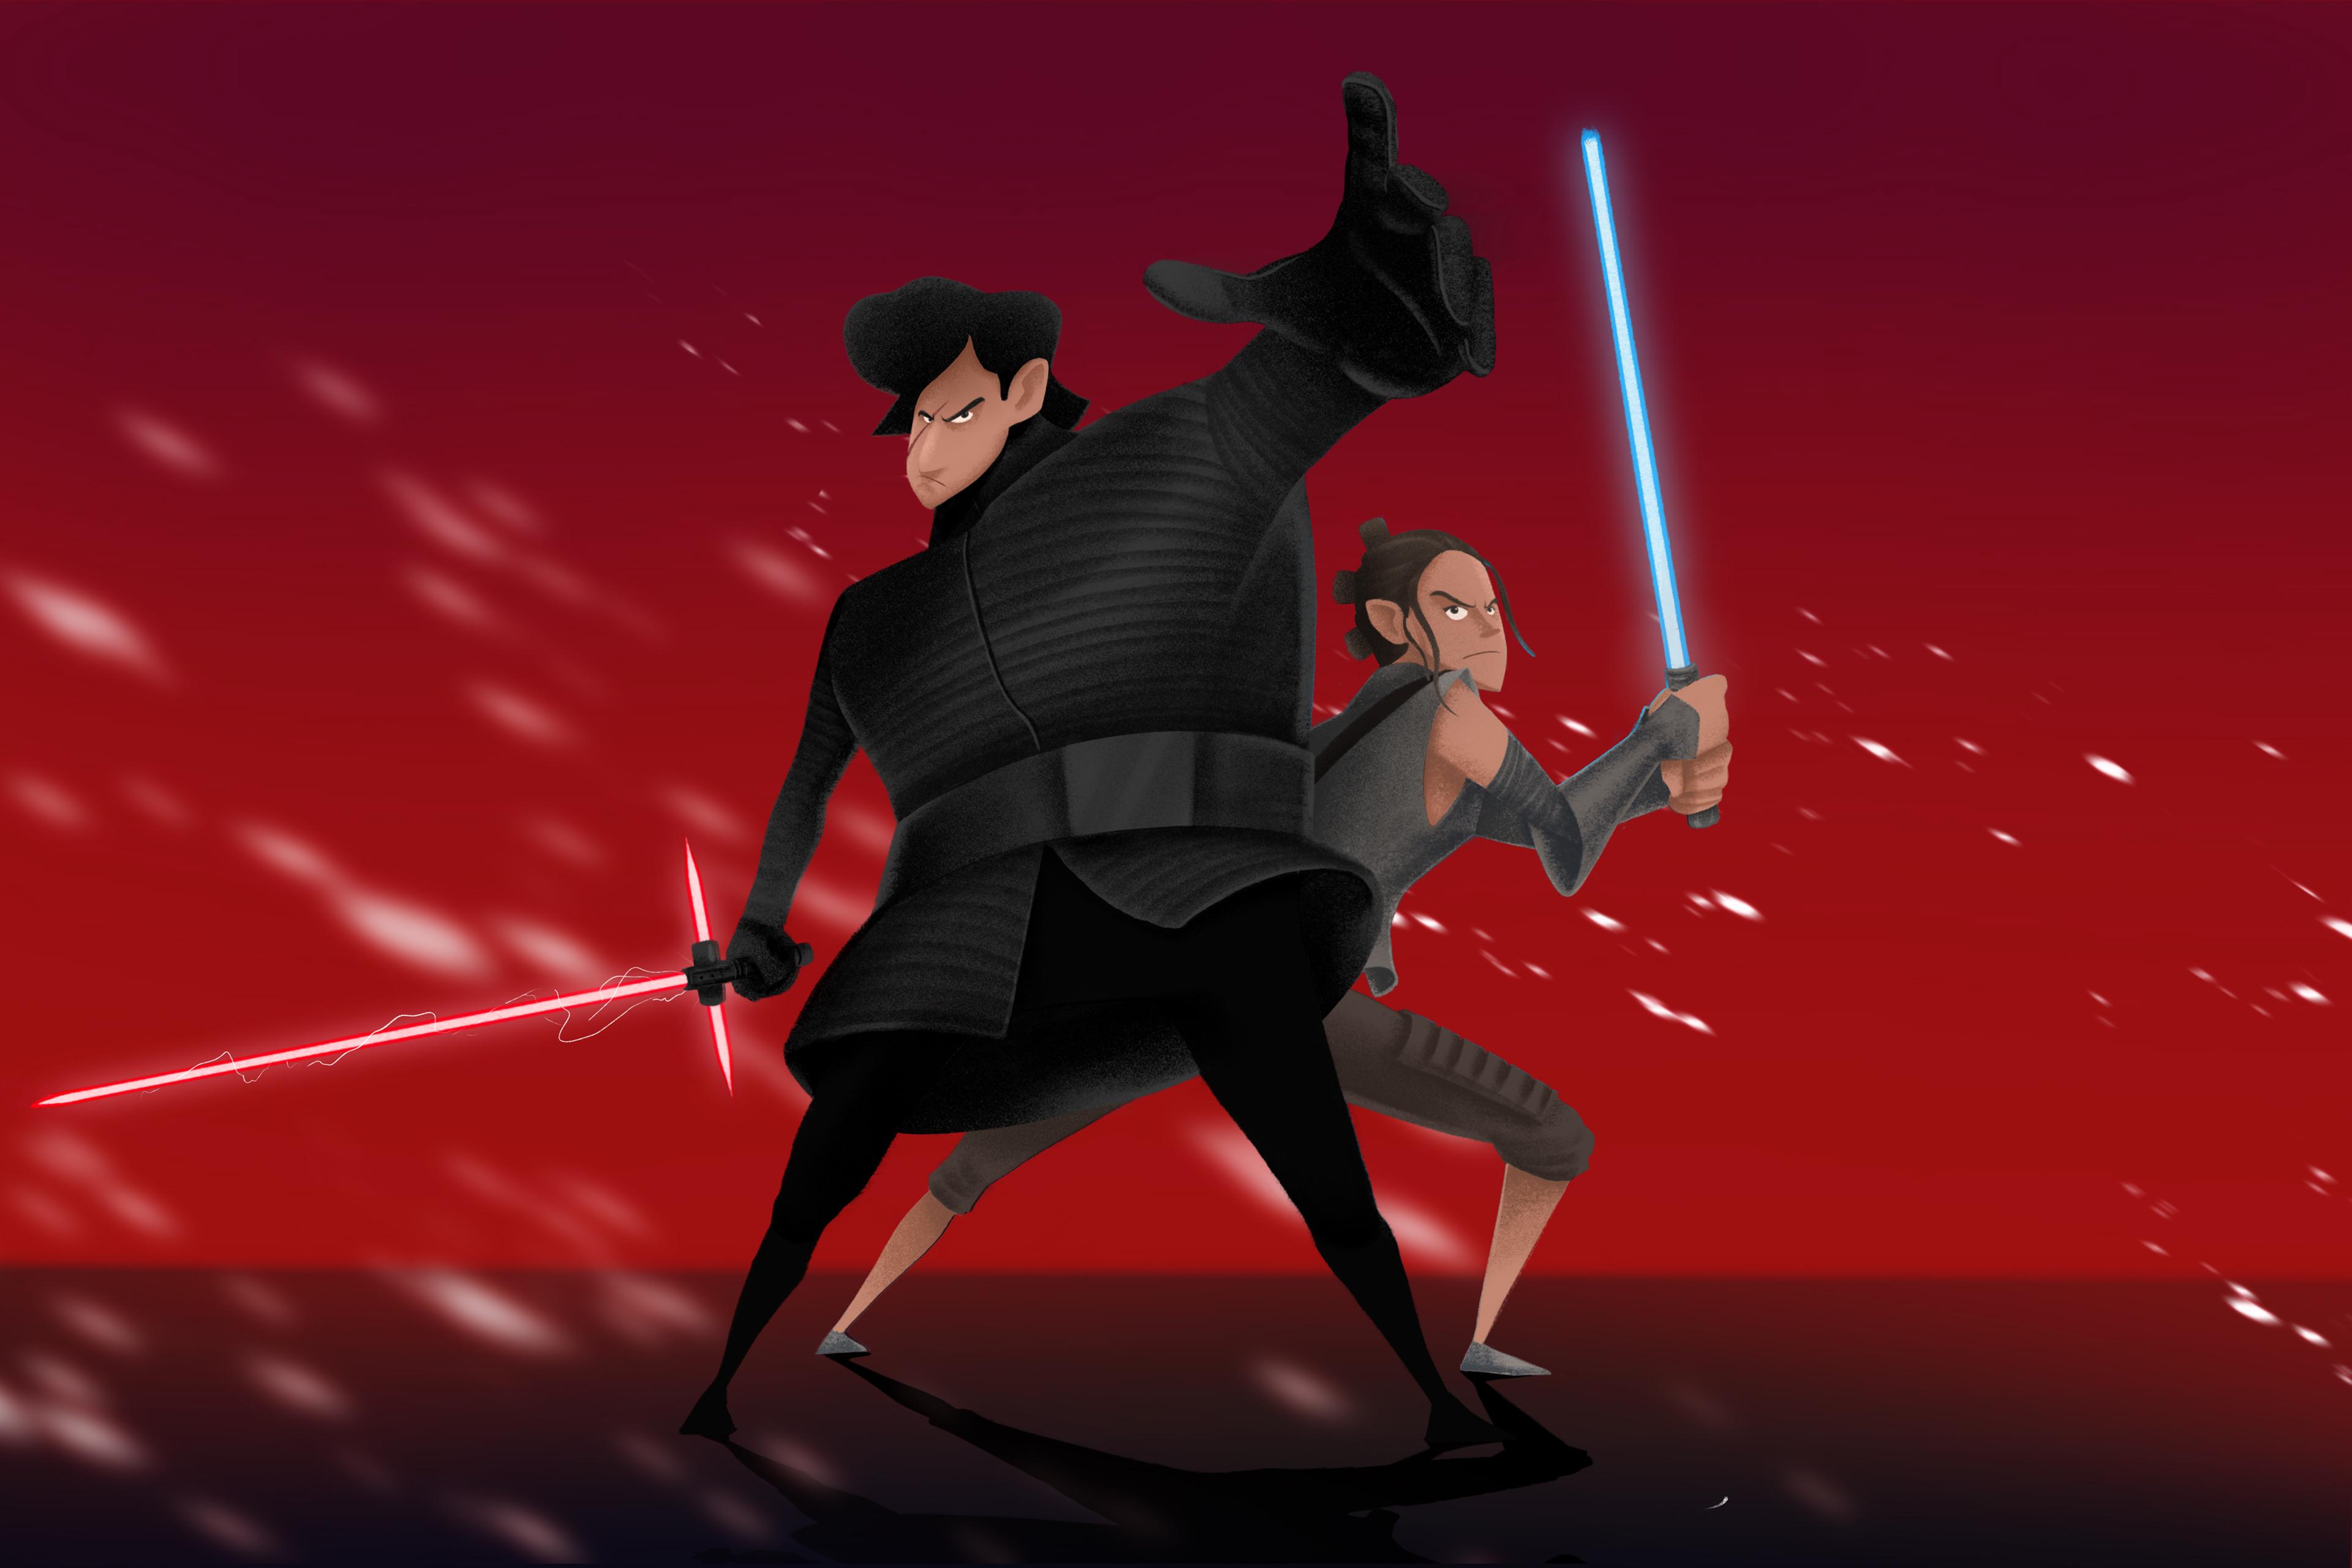 Rey And Kylo Ren Artwork 4k, HD Superheroes, 4k Wallpapers ...